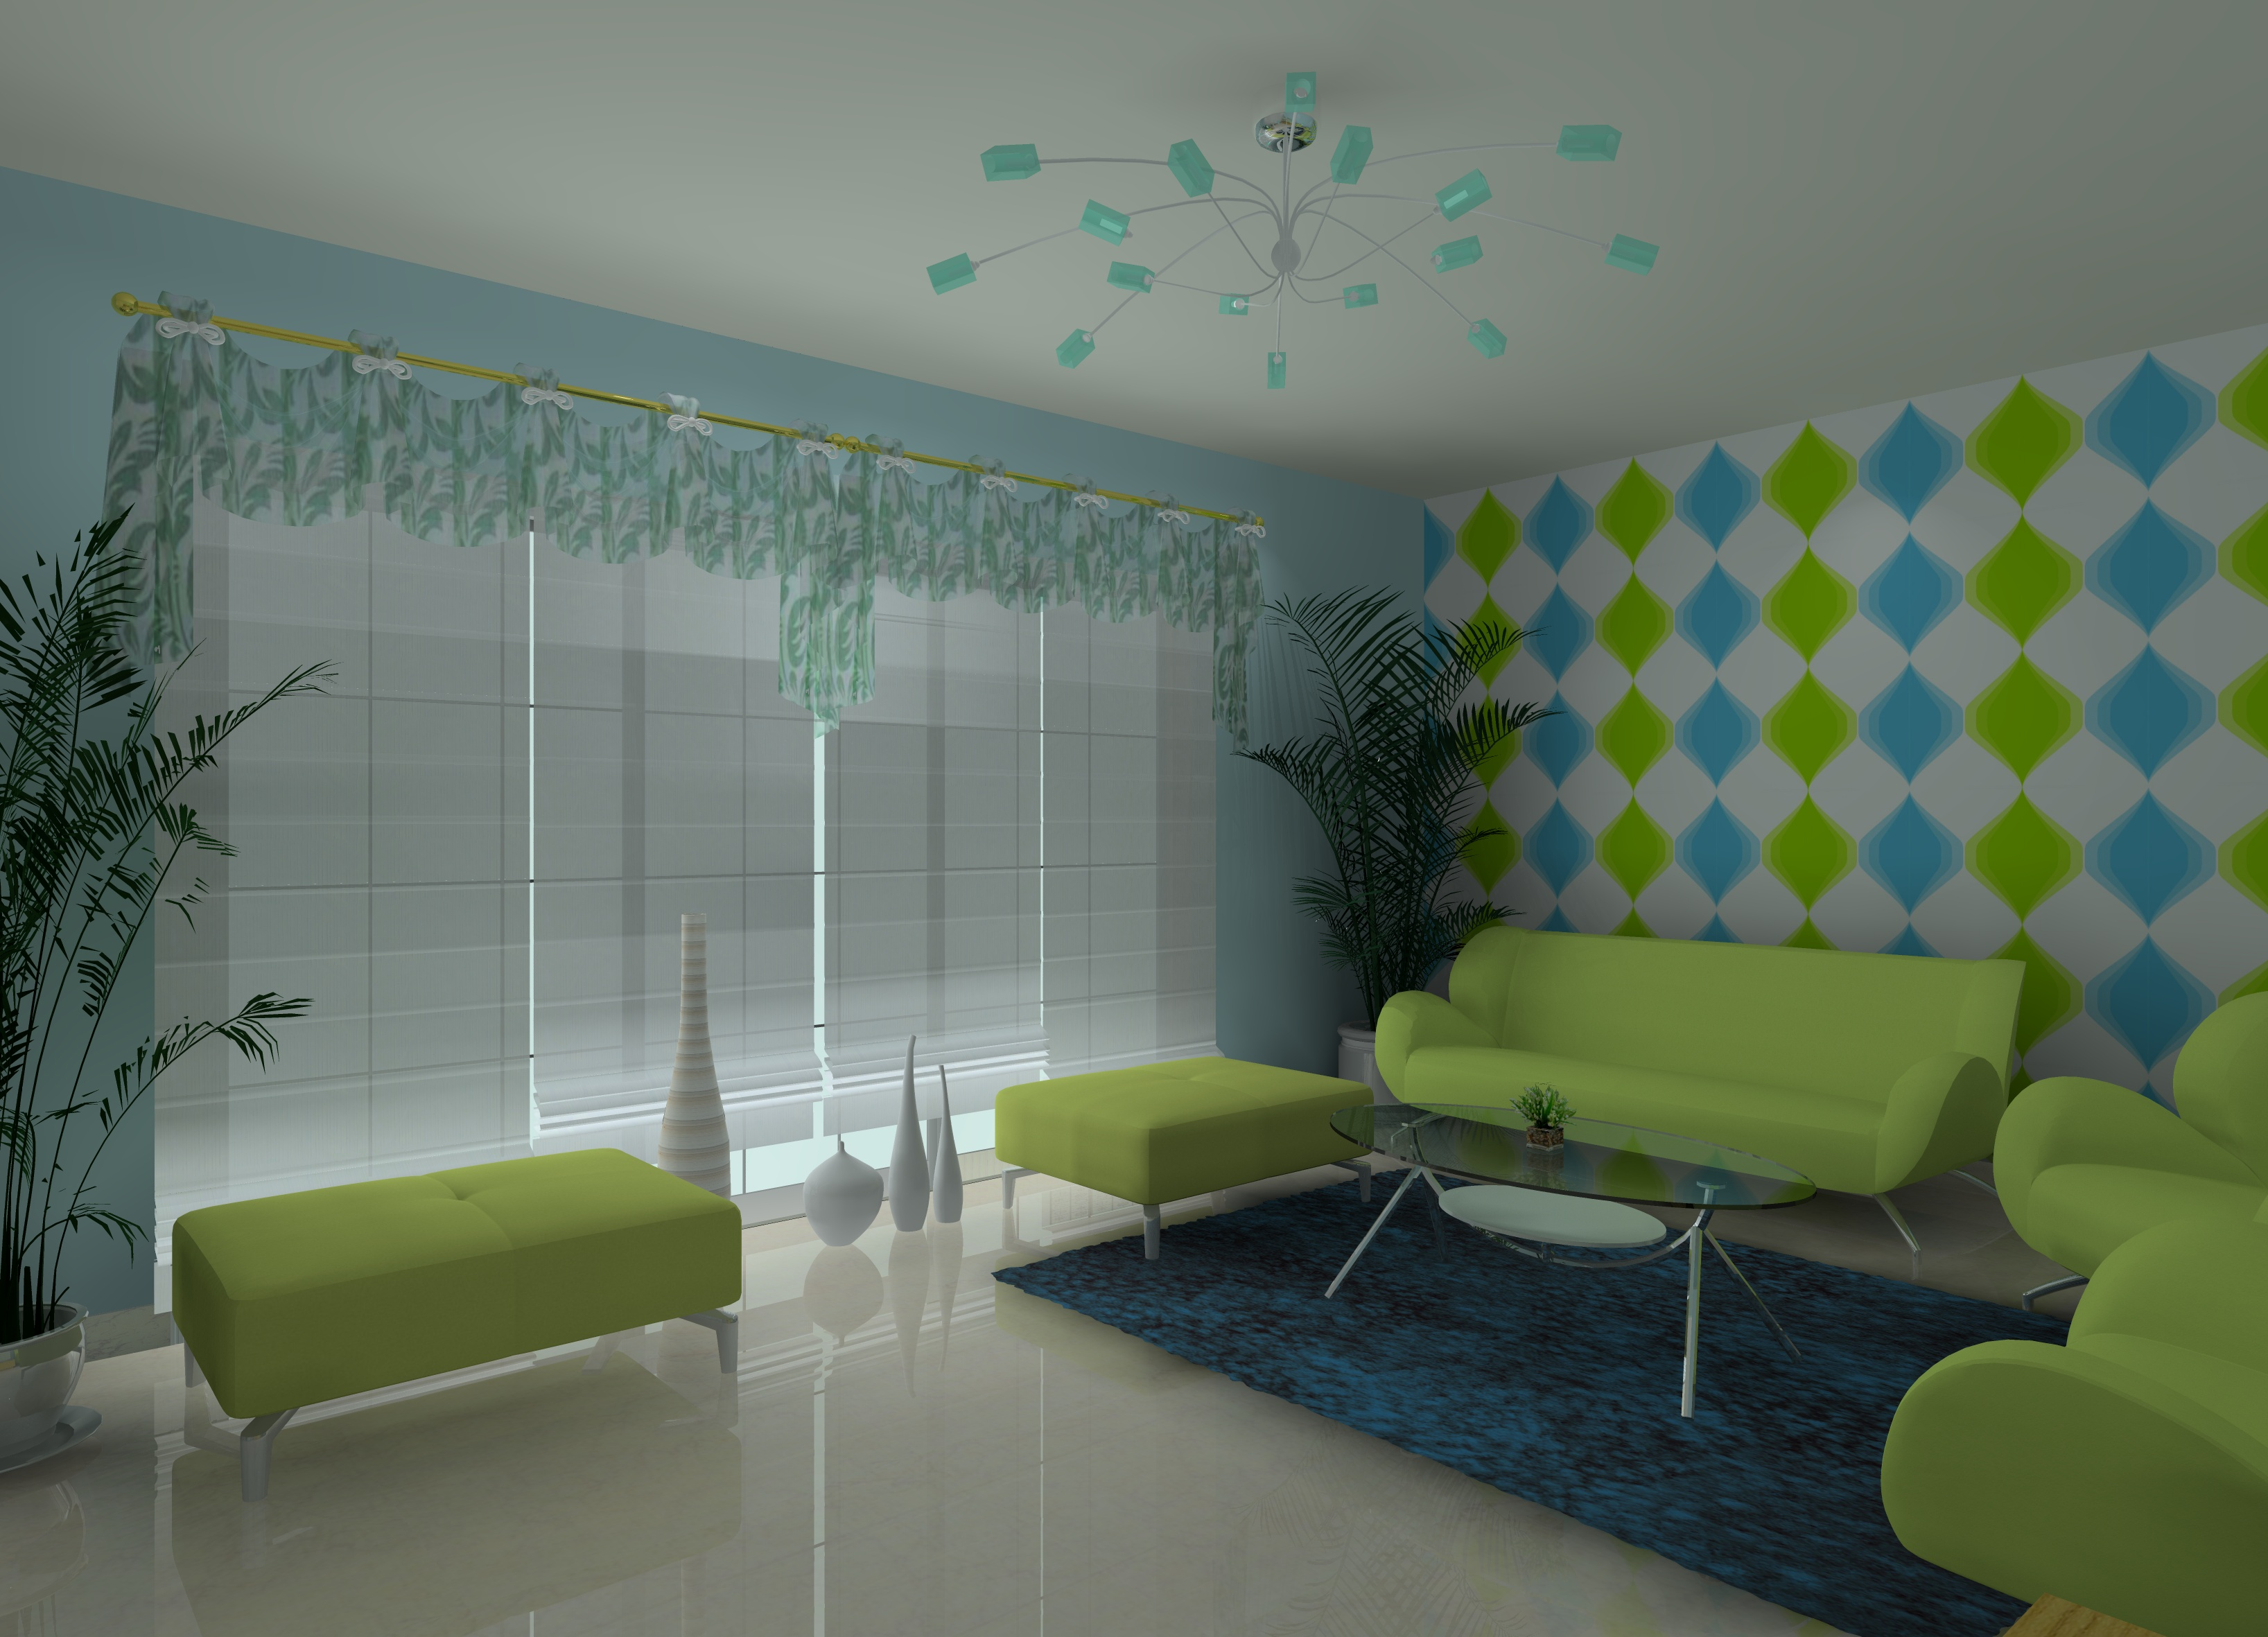 Trucos para refrescar tu casa f cilmente ideas decoradores - Trucos de casa ...